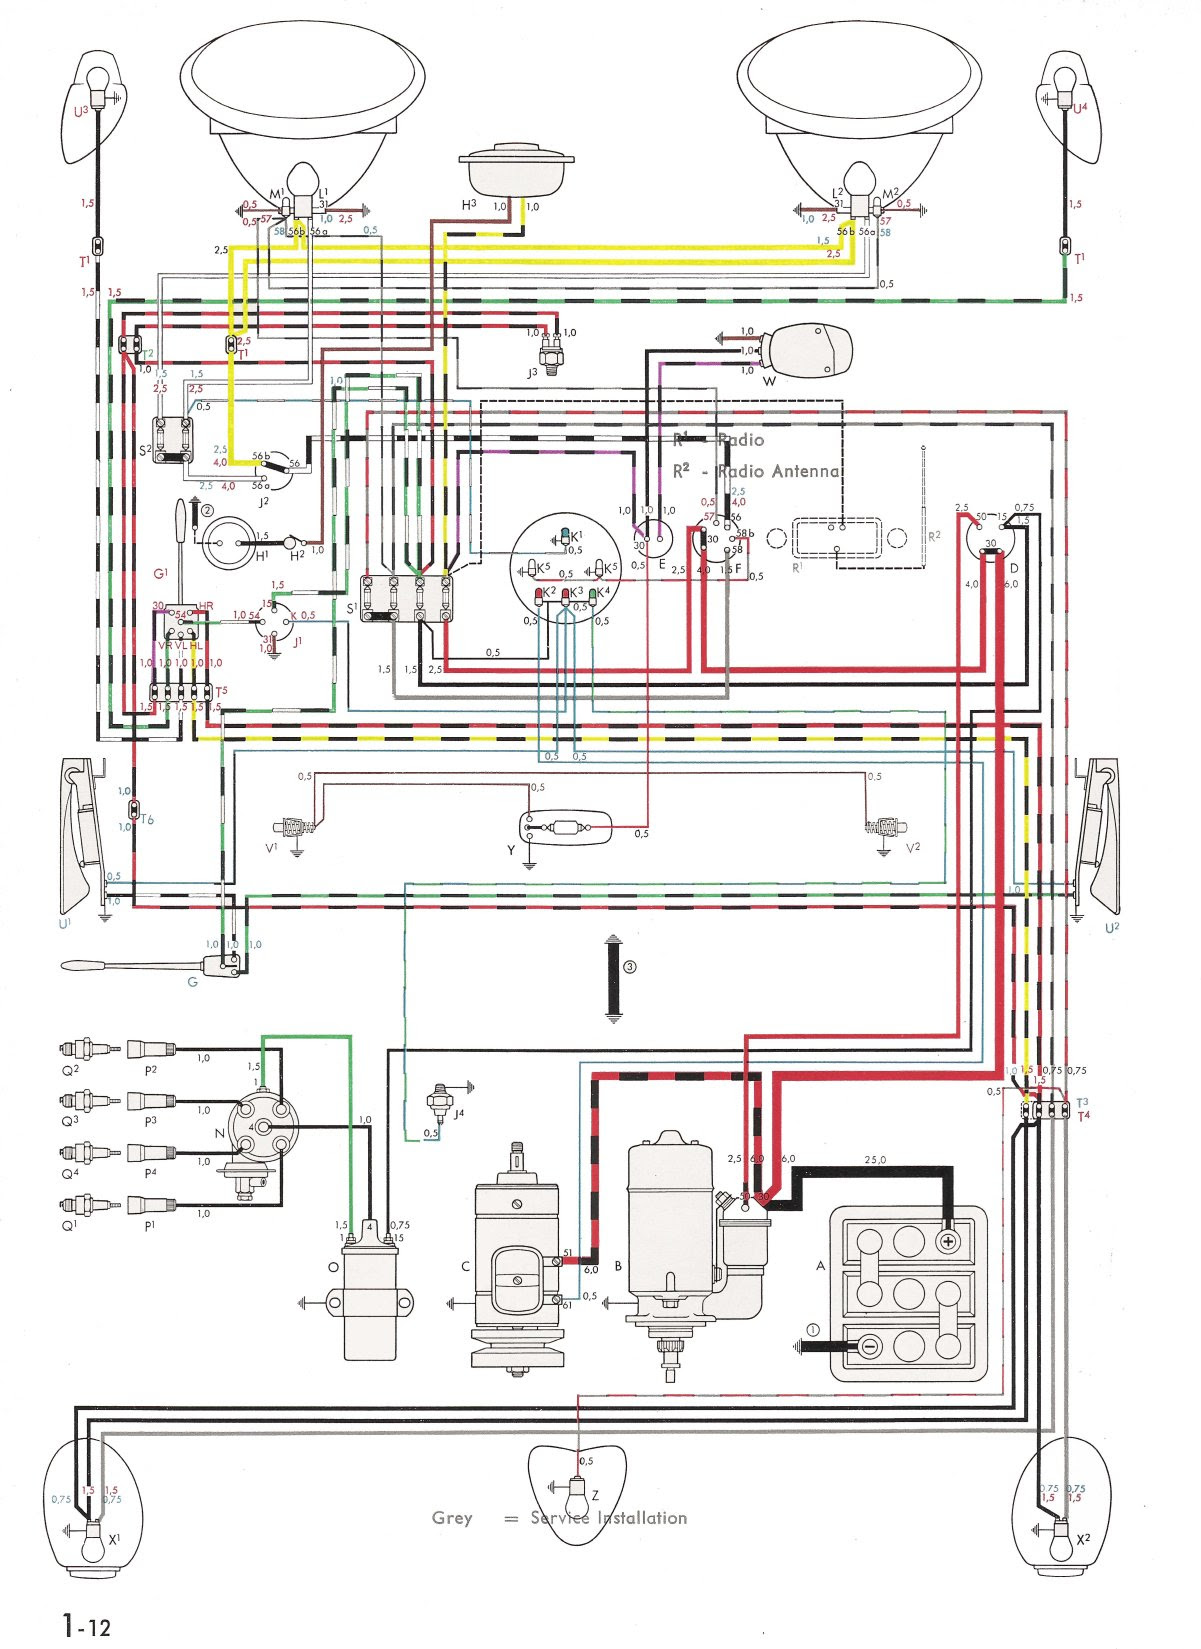 65 vw speedometer wiring diagram image 5